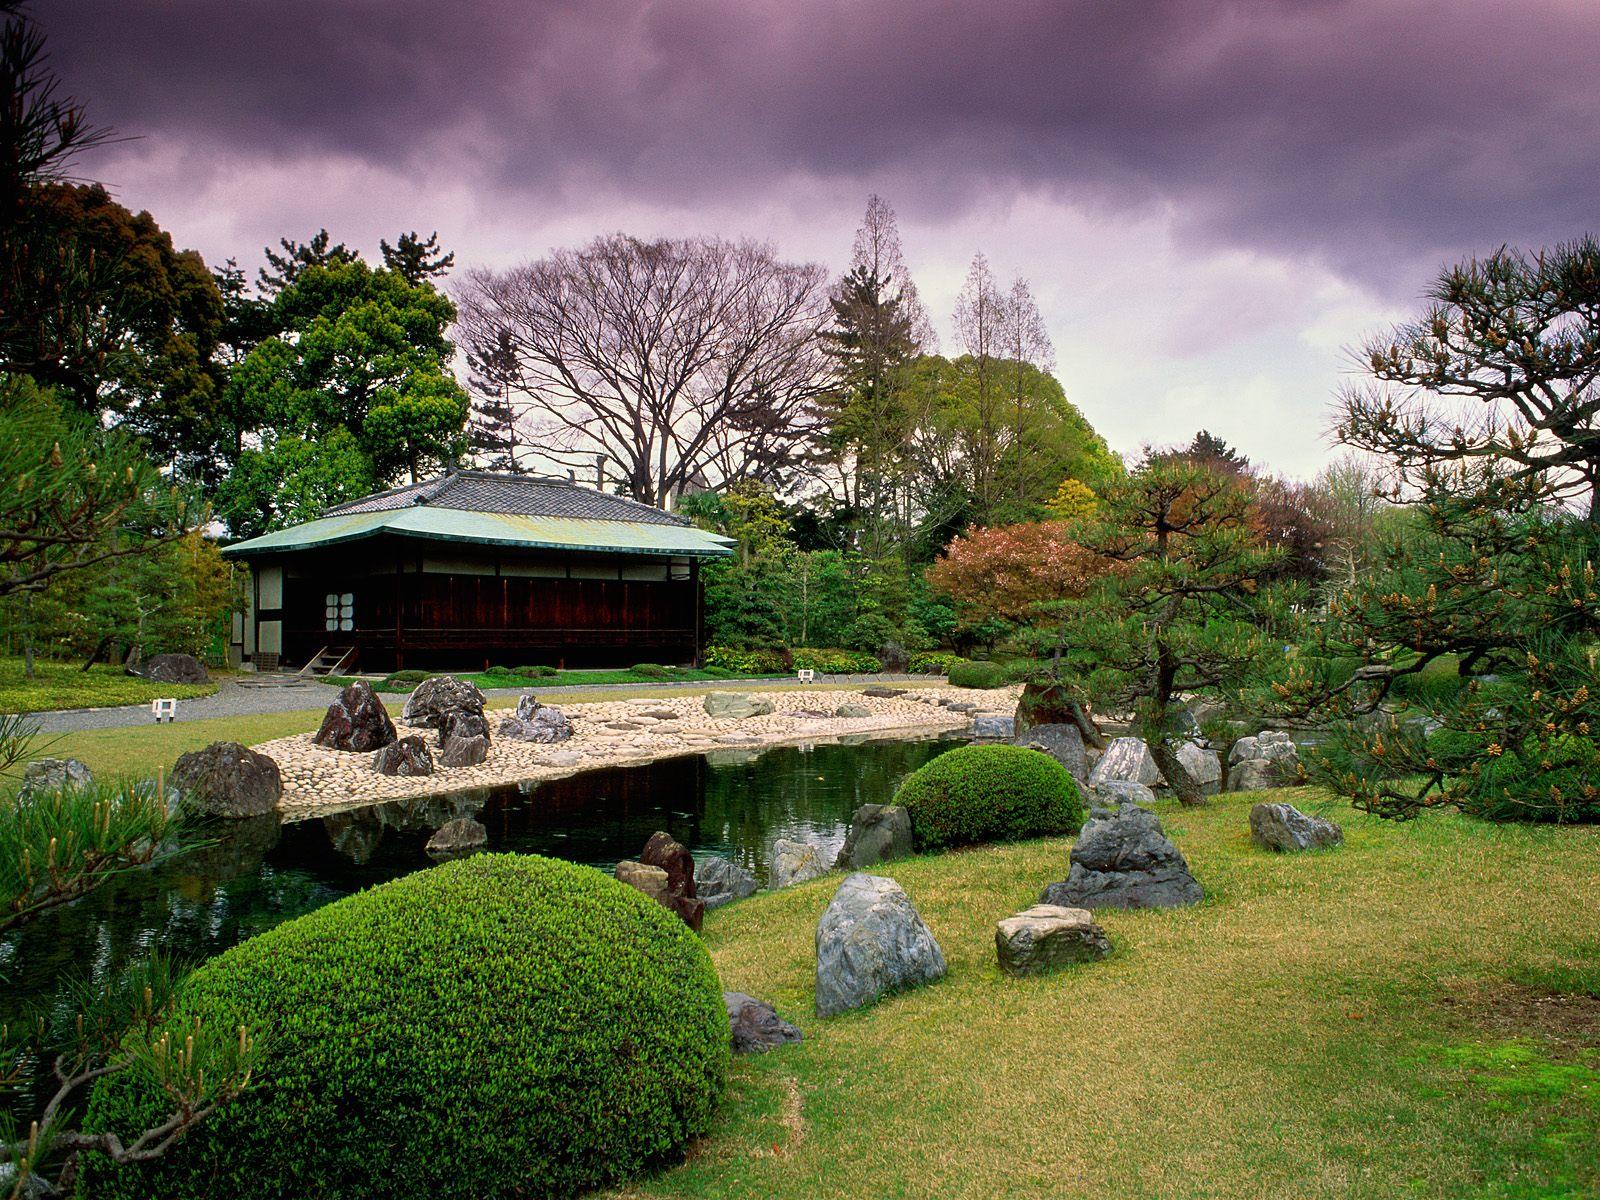 japanese garden wallpapers - Japanese Garden Wallpaper